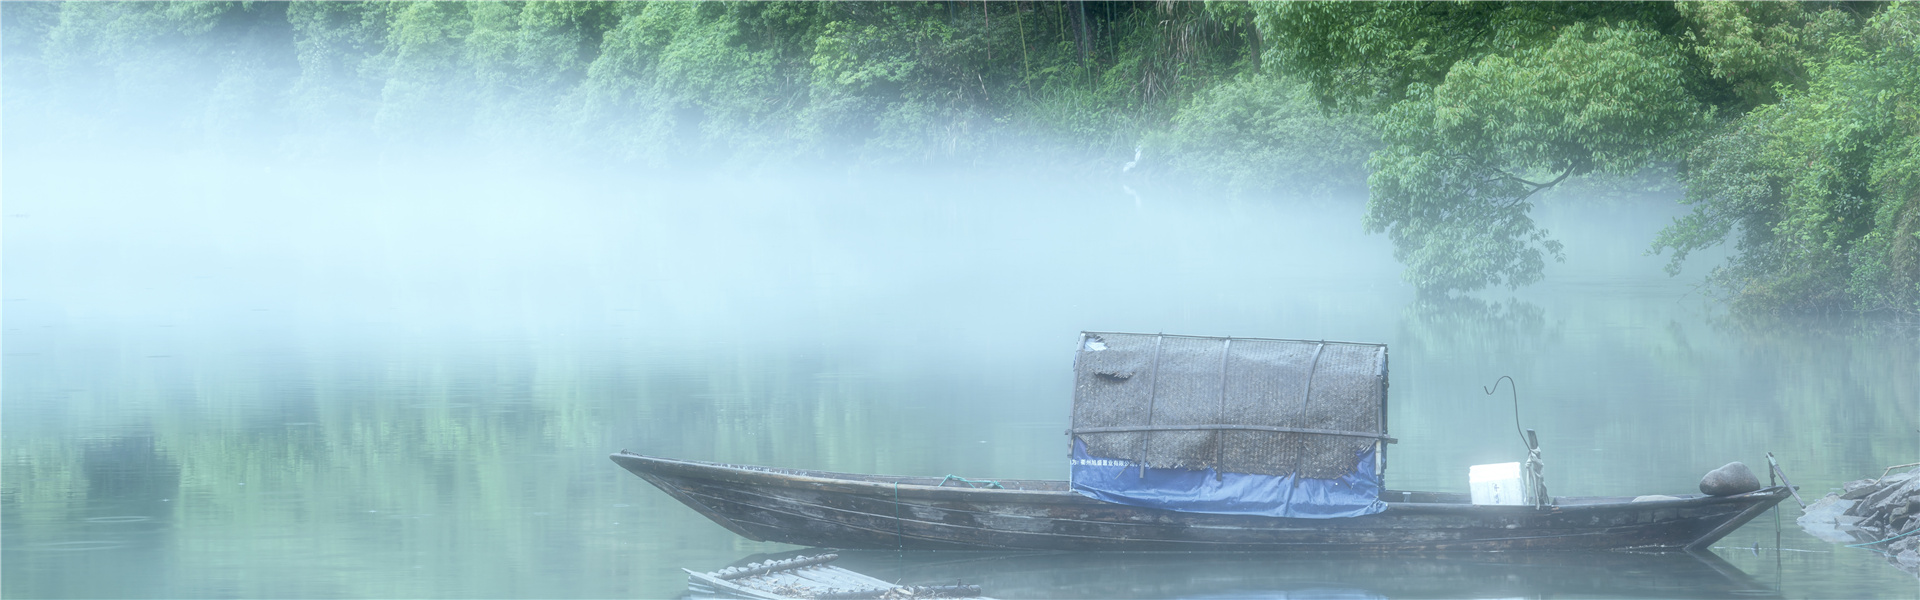 Come enjoy cool summer in Quzhou